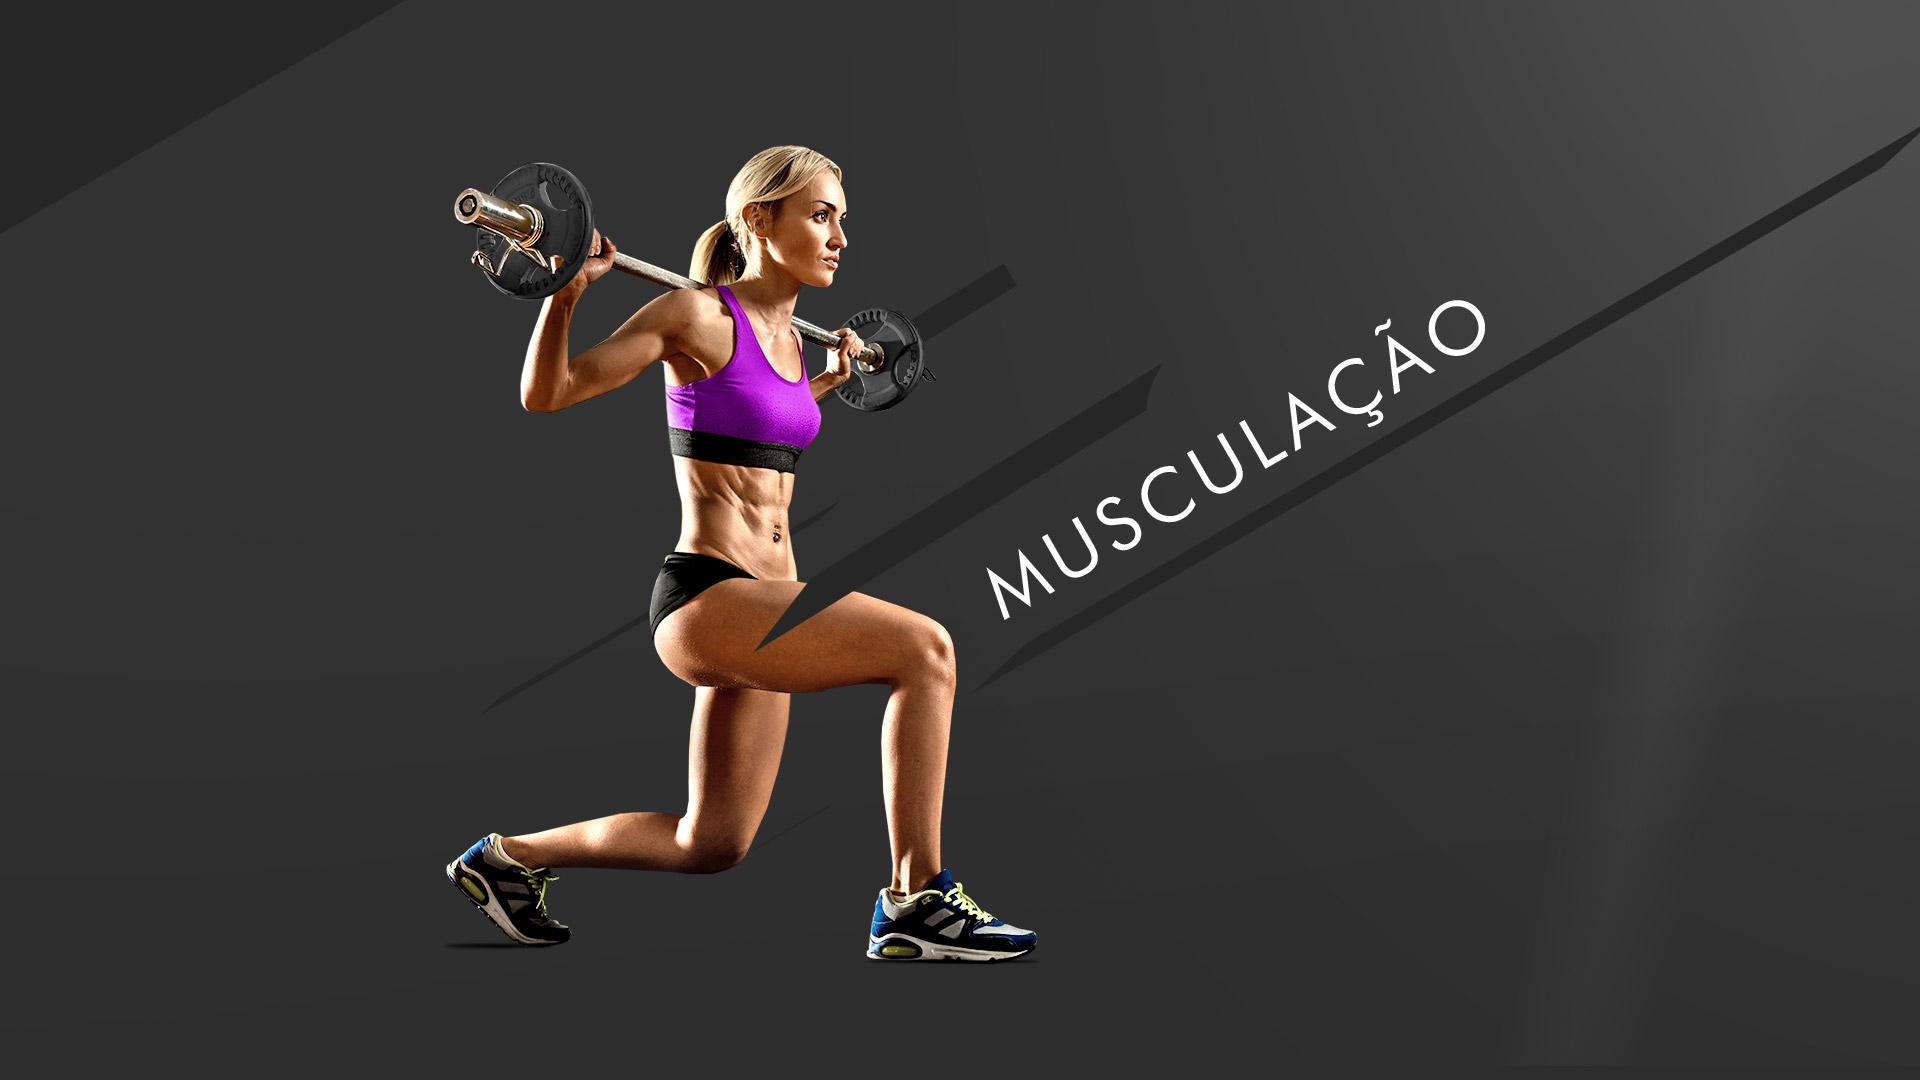 Banner-Destaque-Gaya-fitness-Musculacao-1920x1080